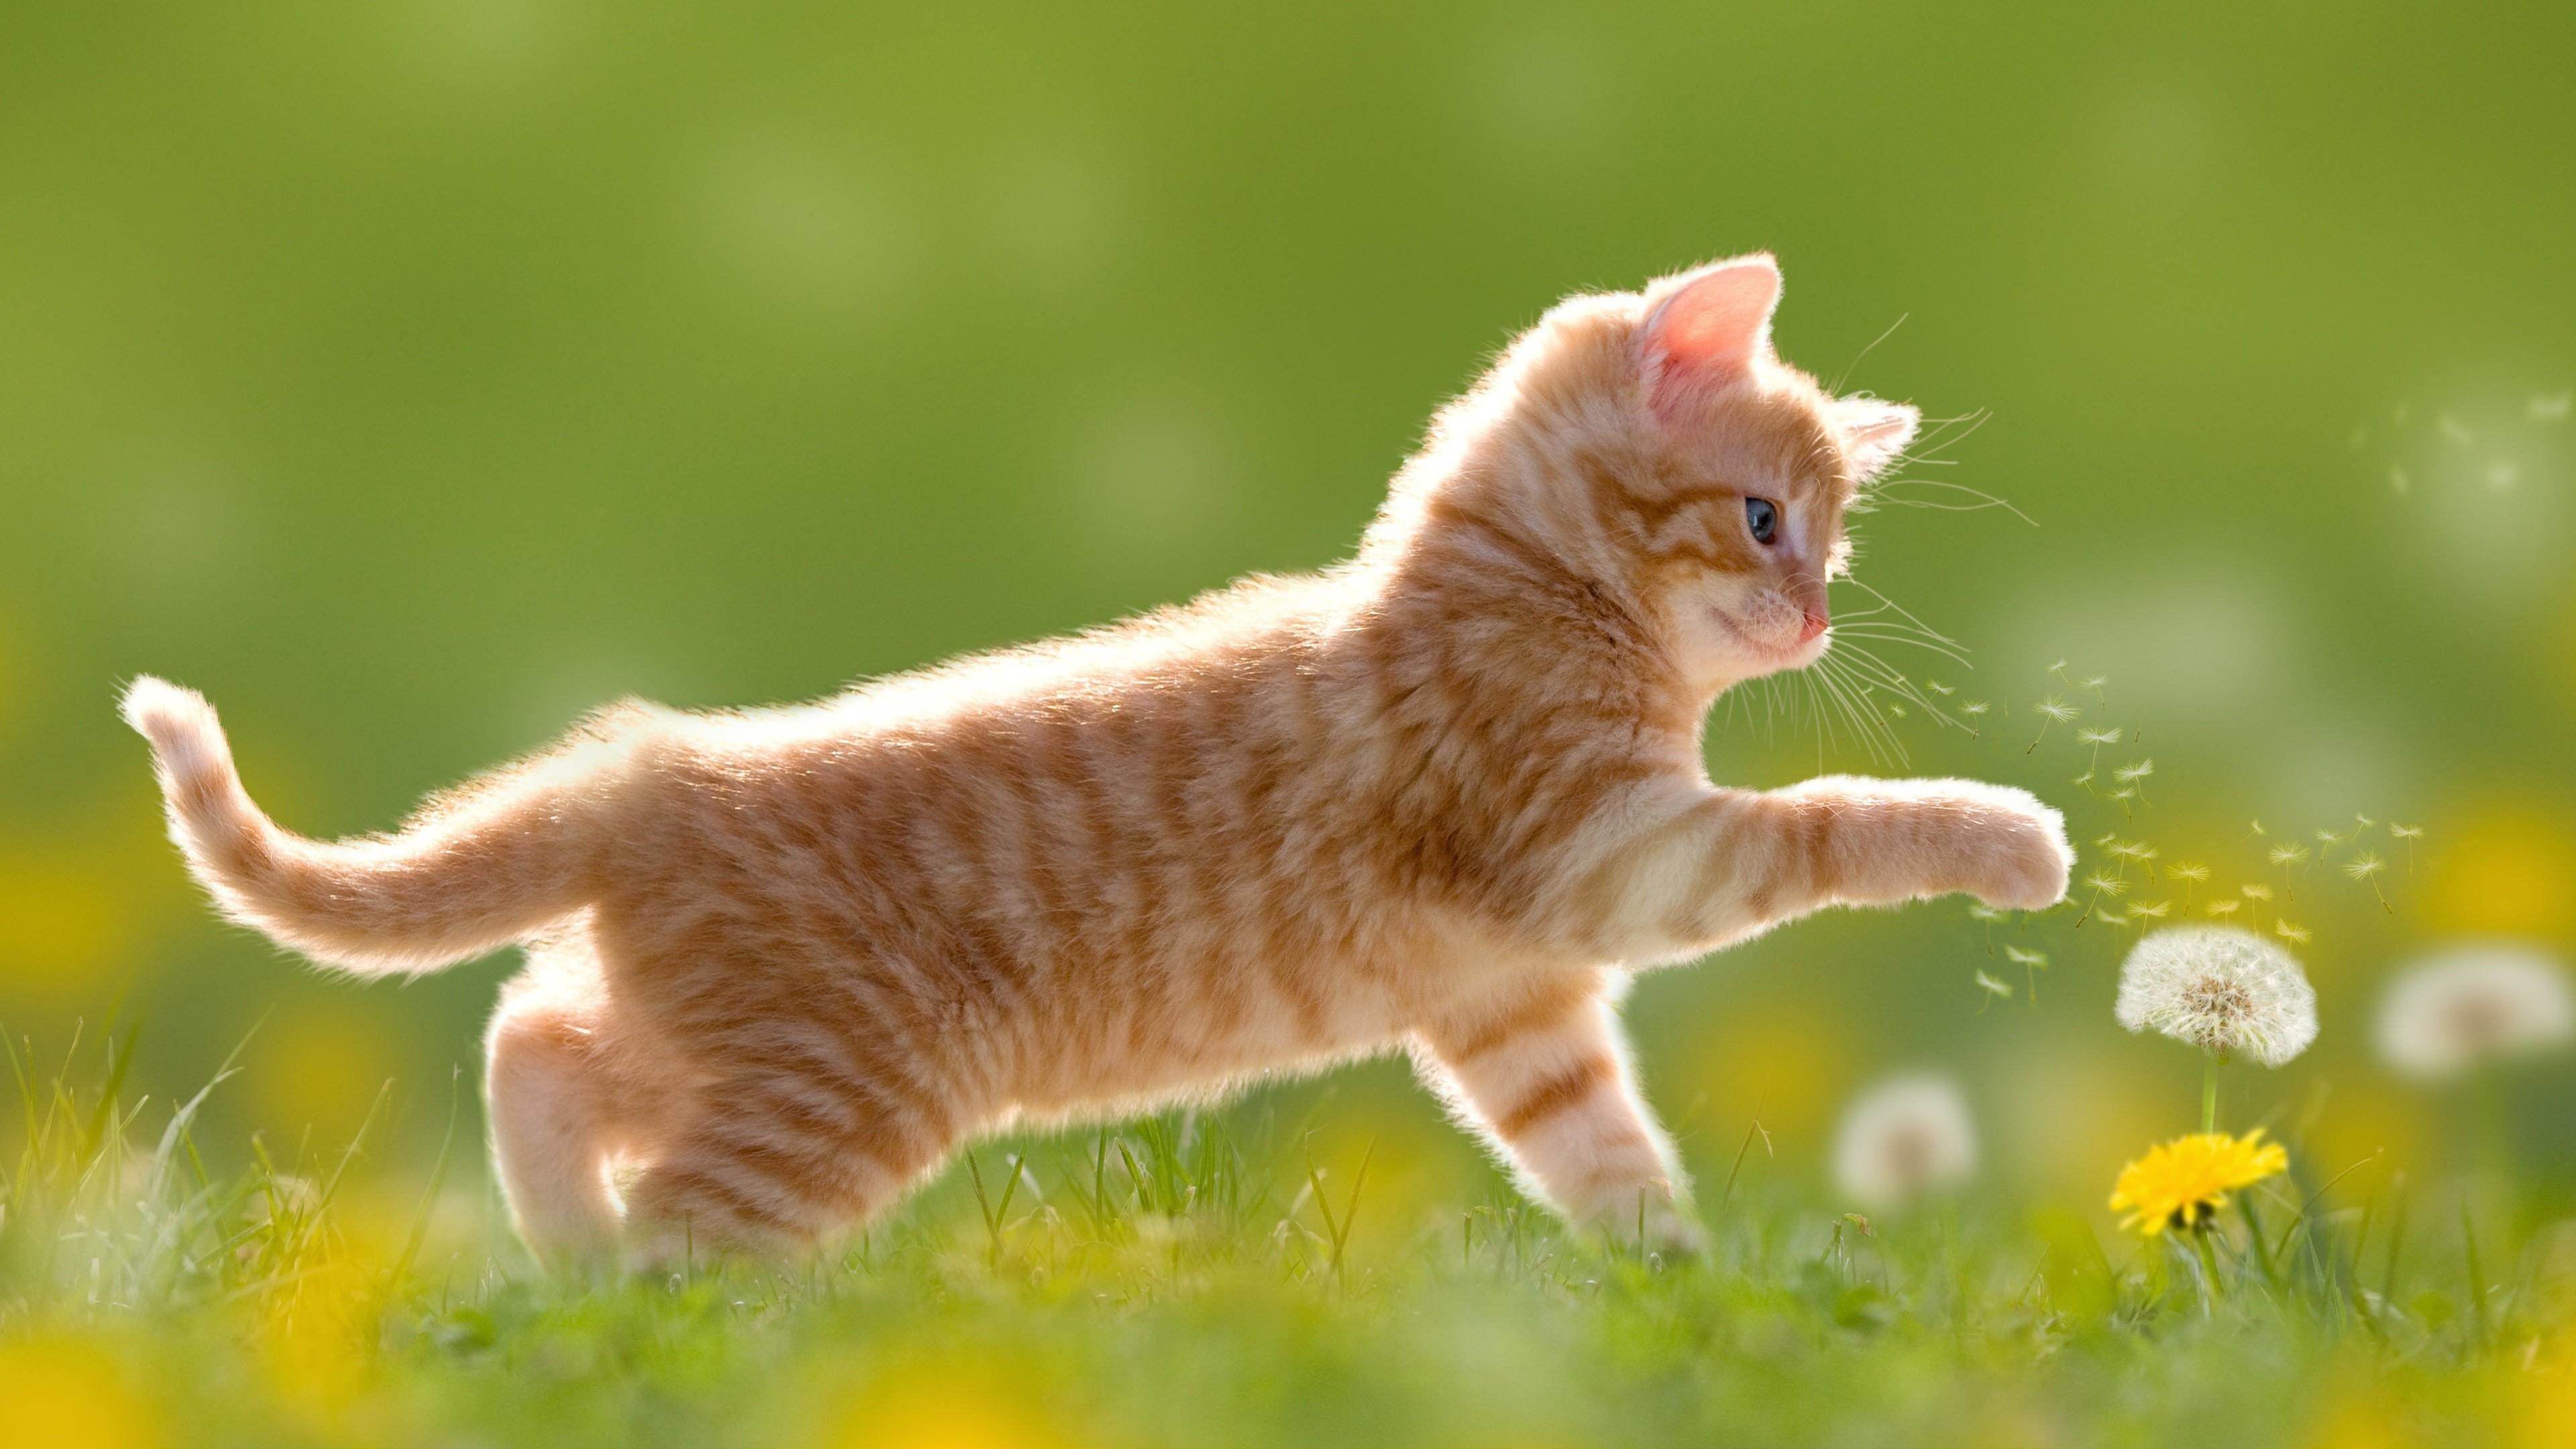 1920x1080, Kitty Play - Kitten Playing , HD Wallpaper & Backgrounds